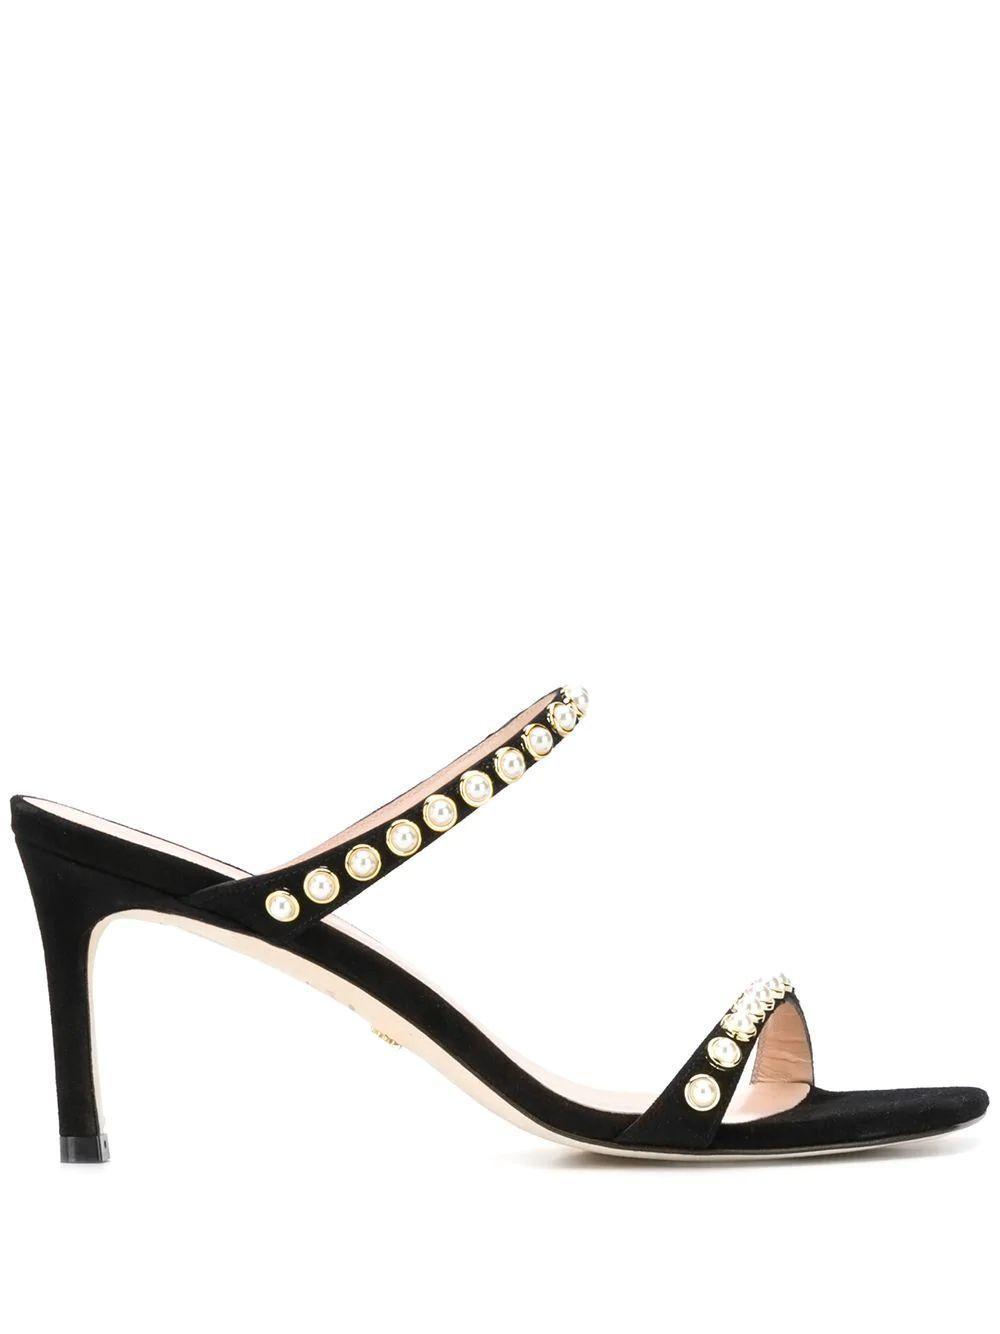 Aleena Pearl Strap Sandal